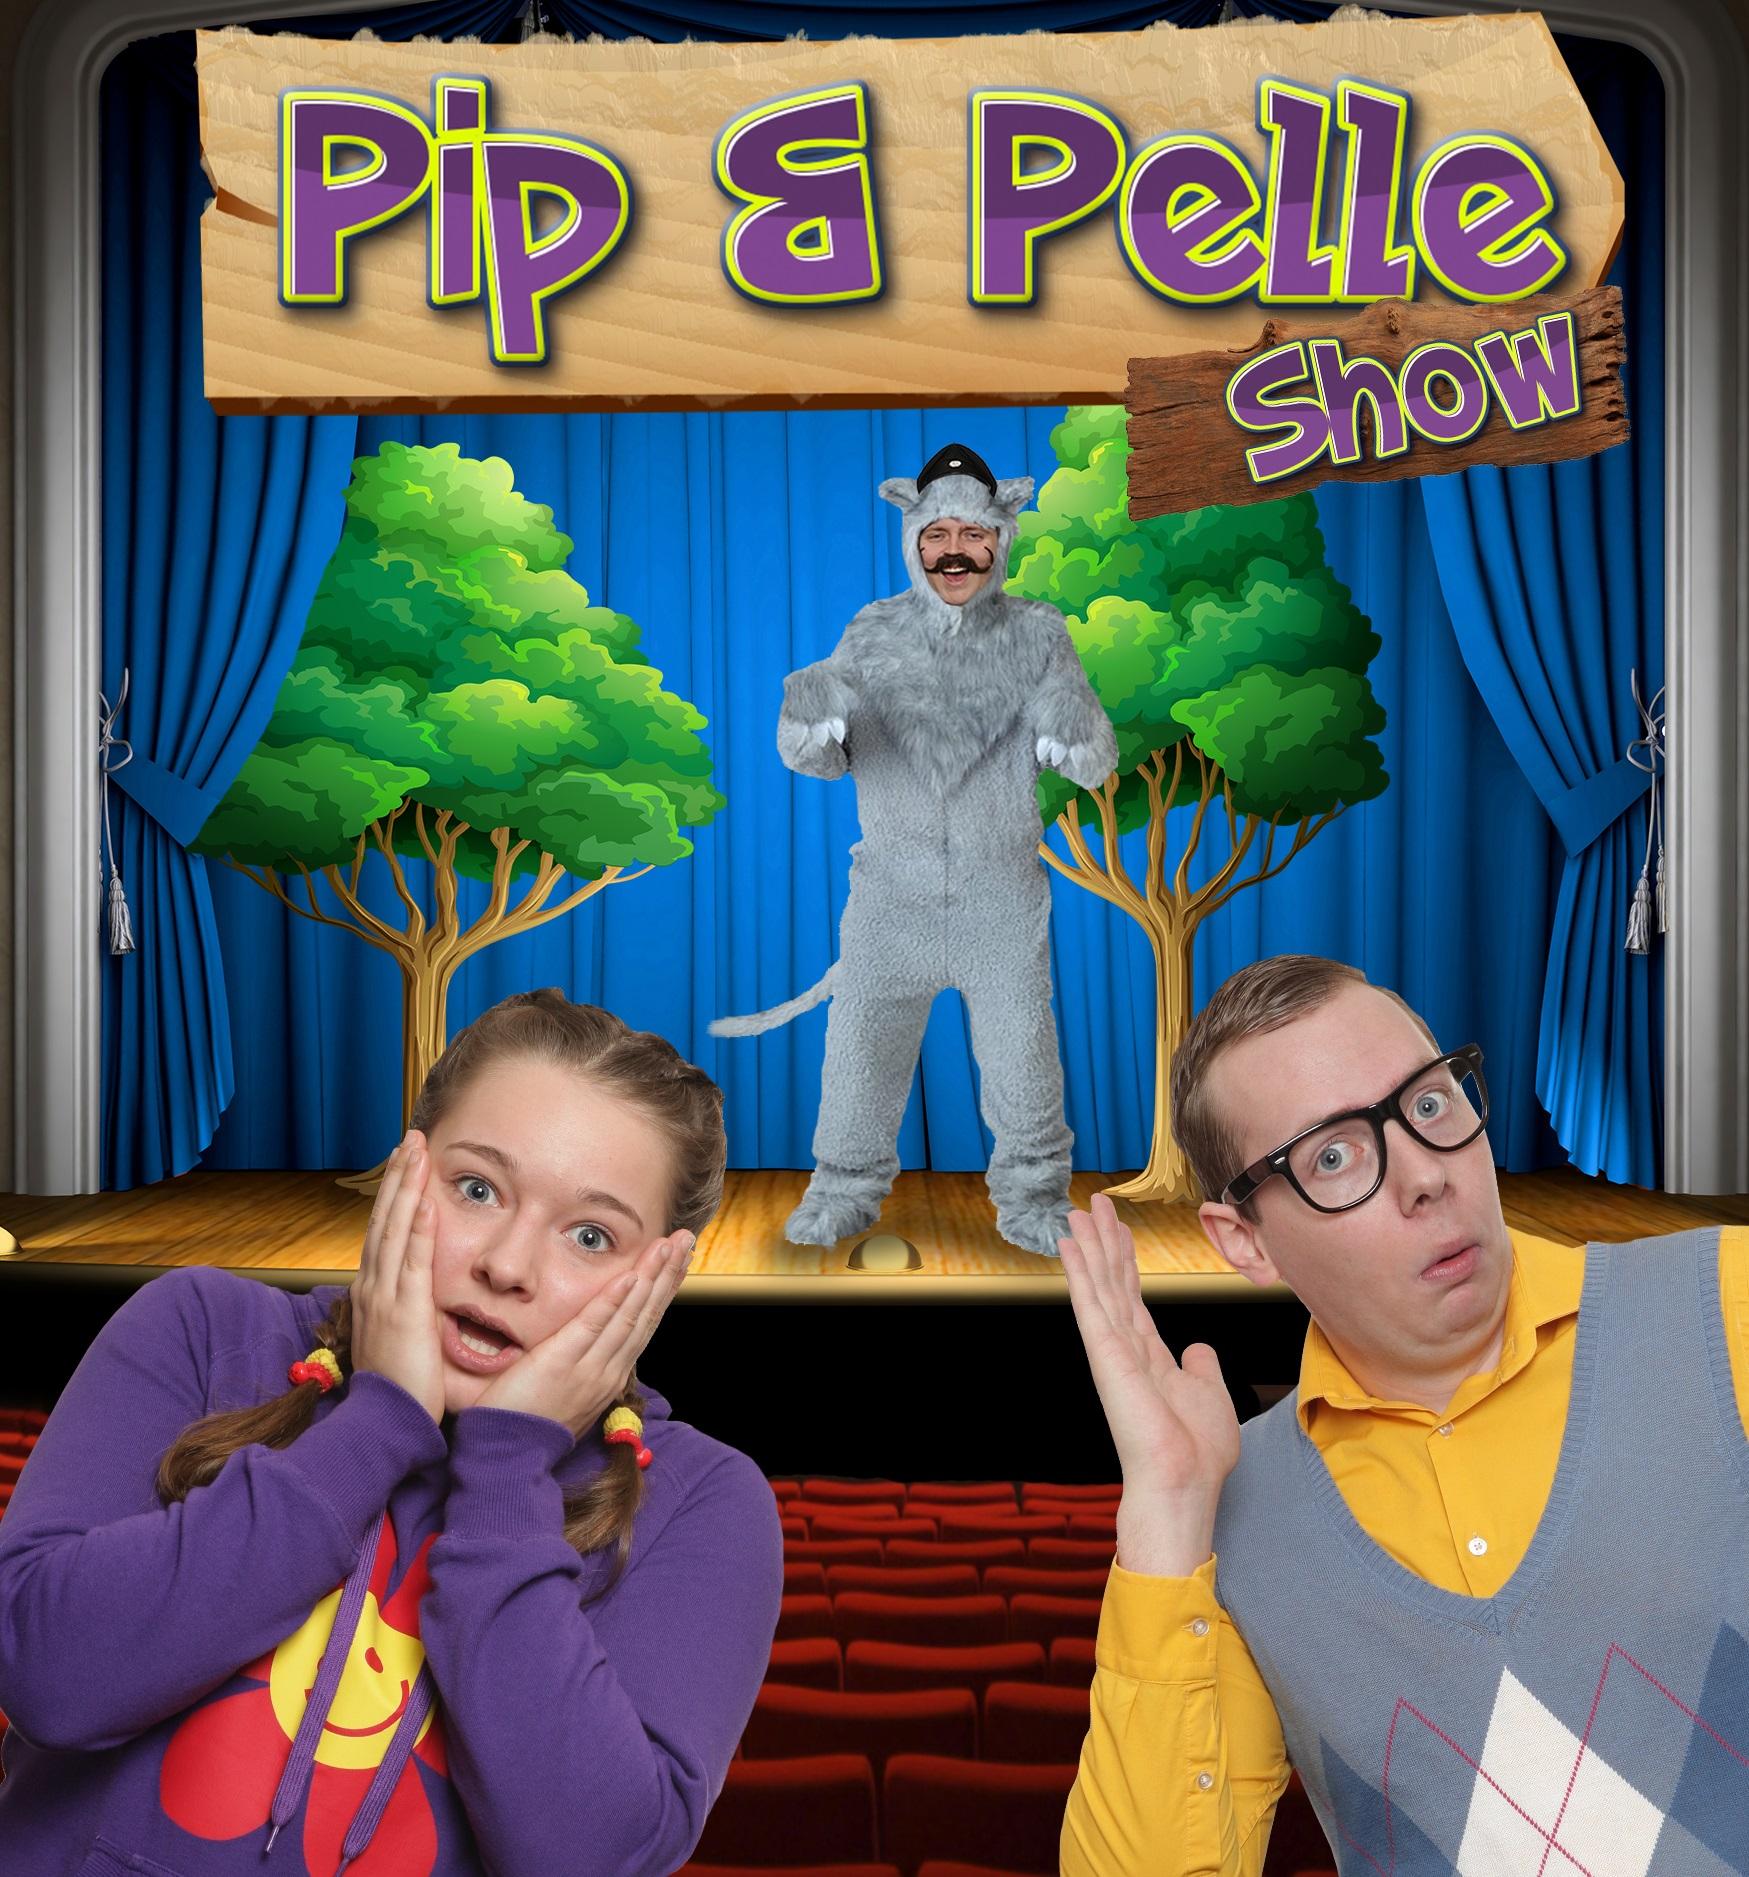 Pip & Pelle. (Foto: aangeleverd)